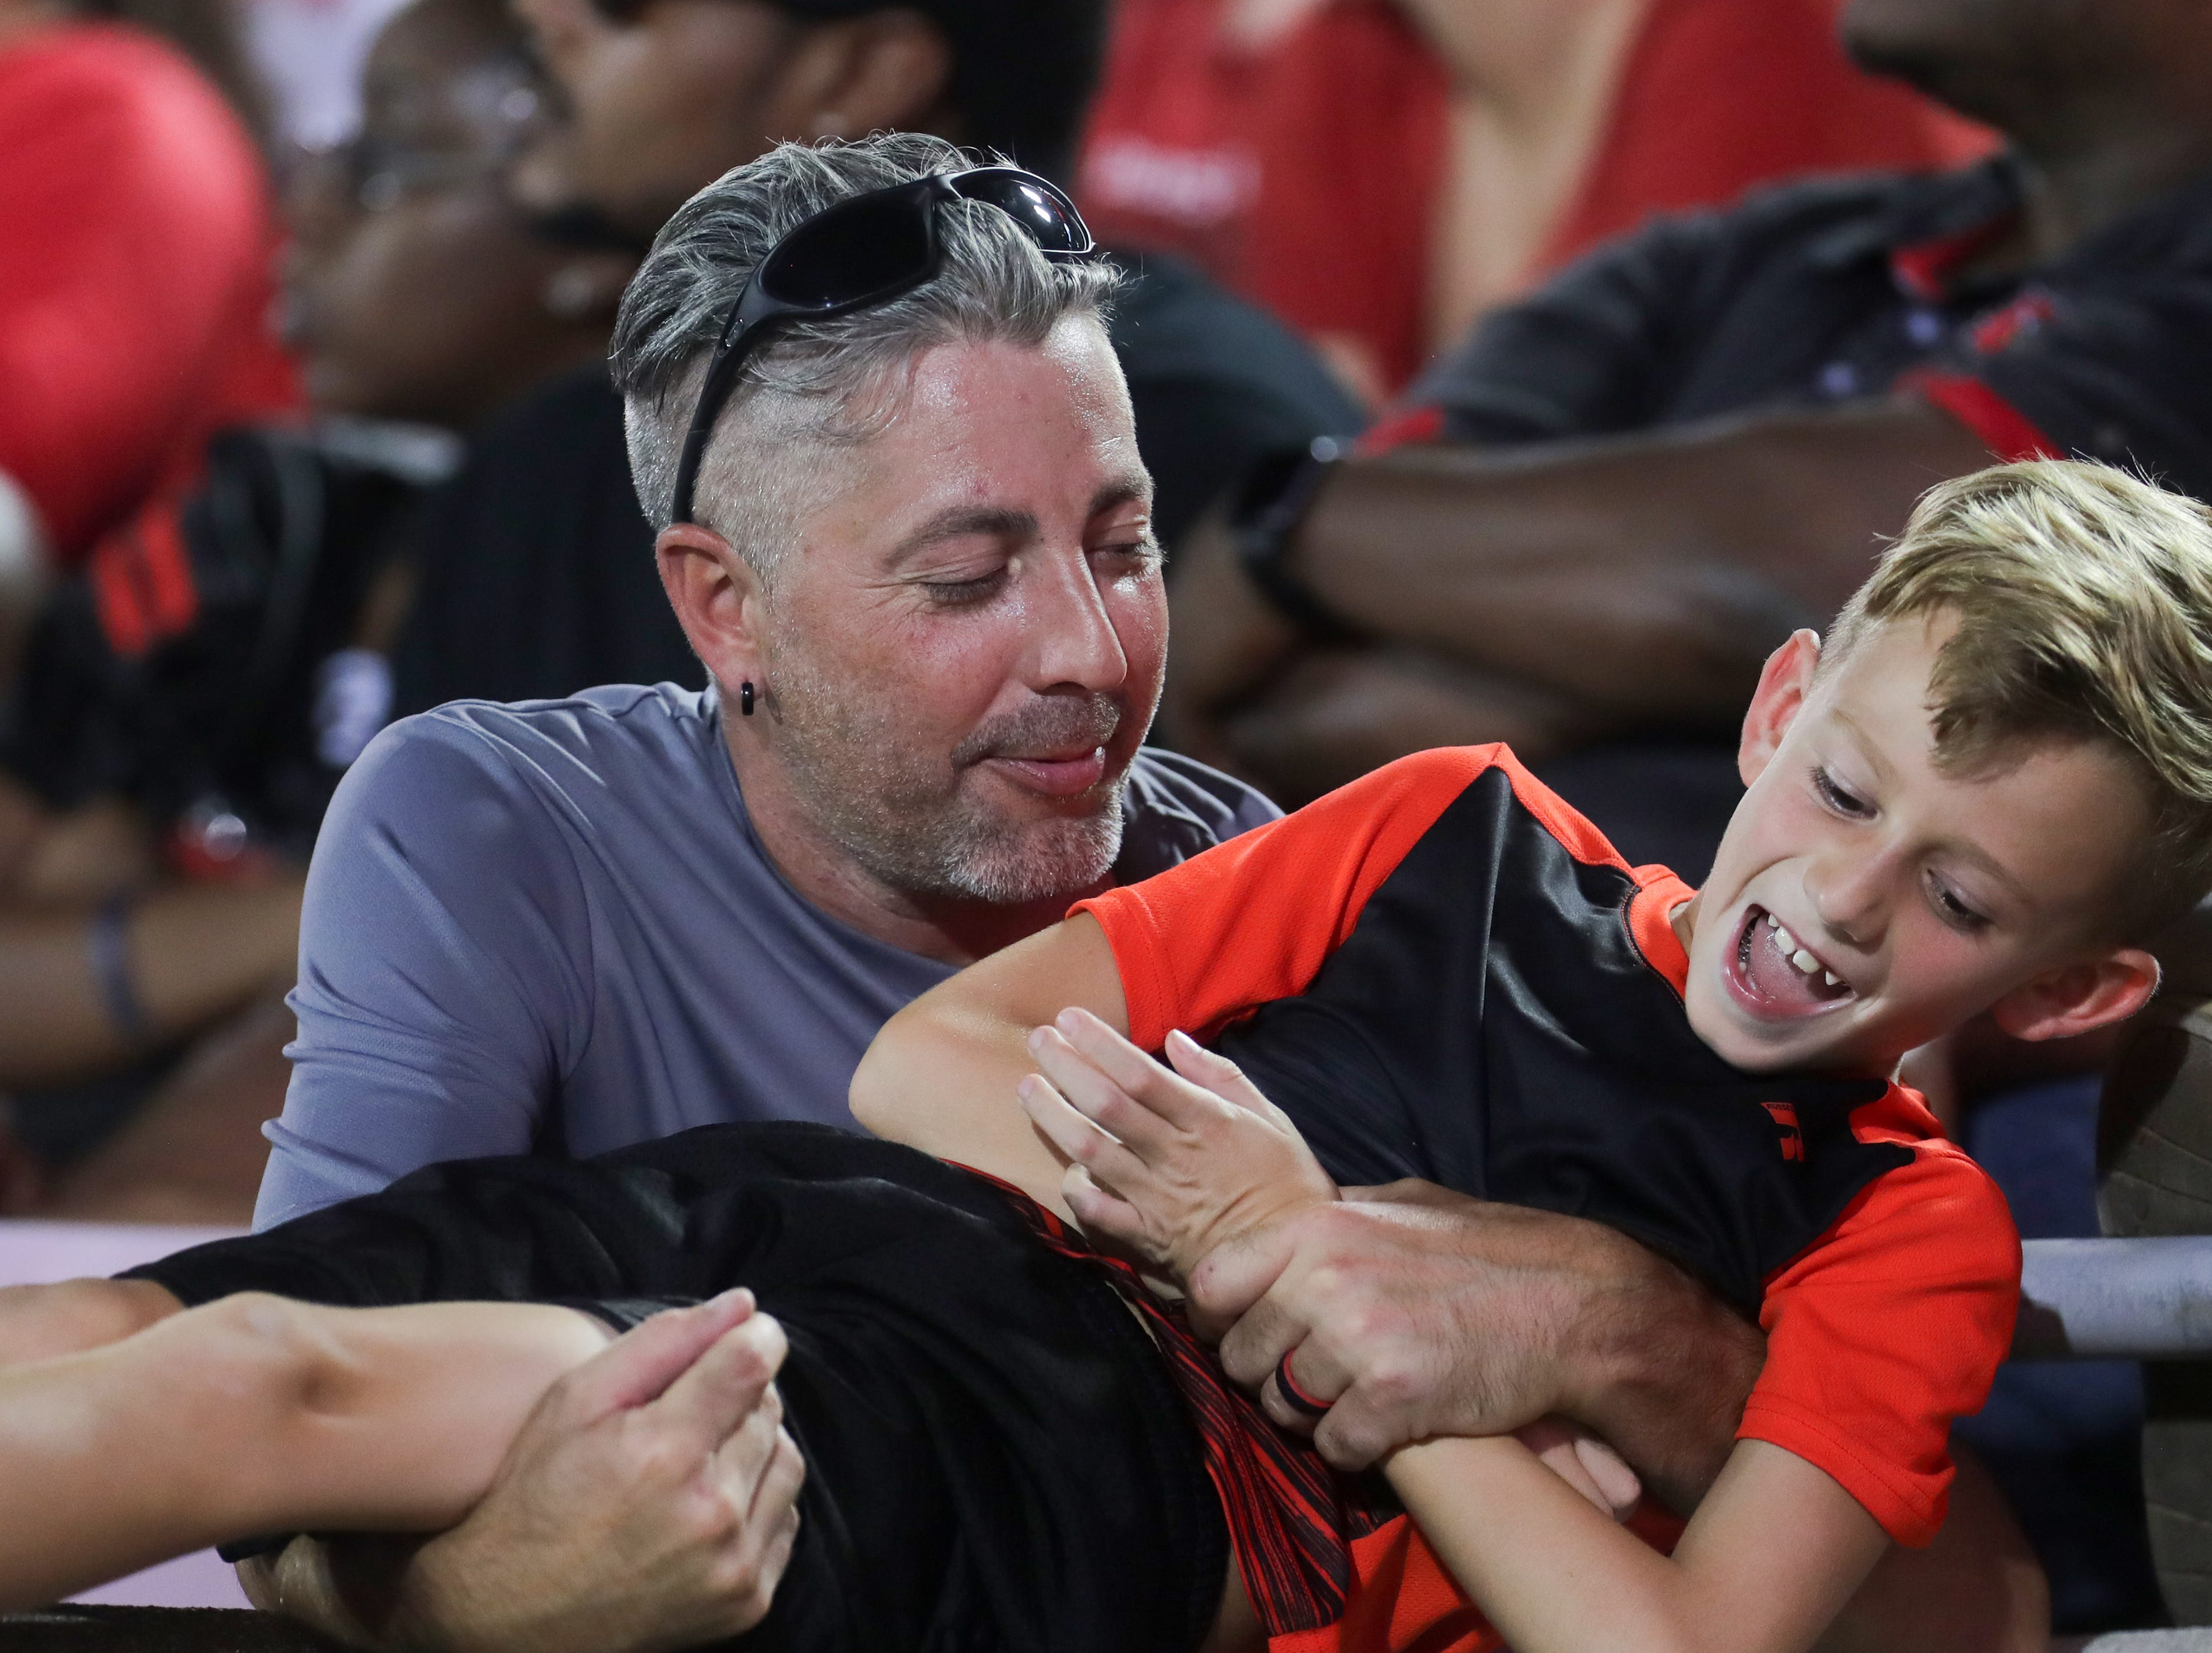 Louisville fans having a little fun in between plays. Sept. 15, 2018